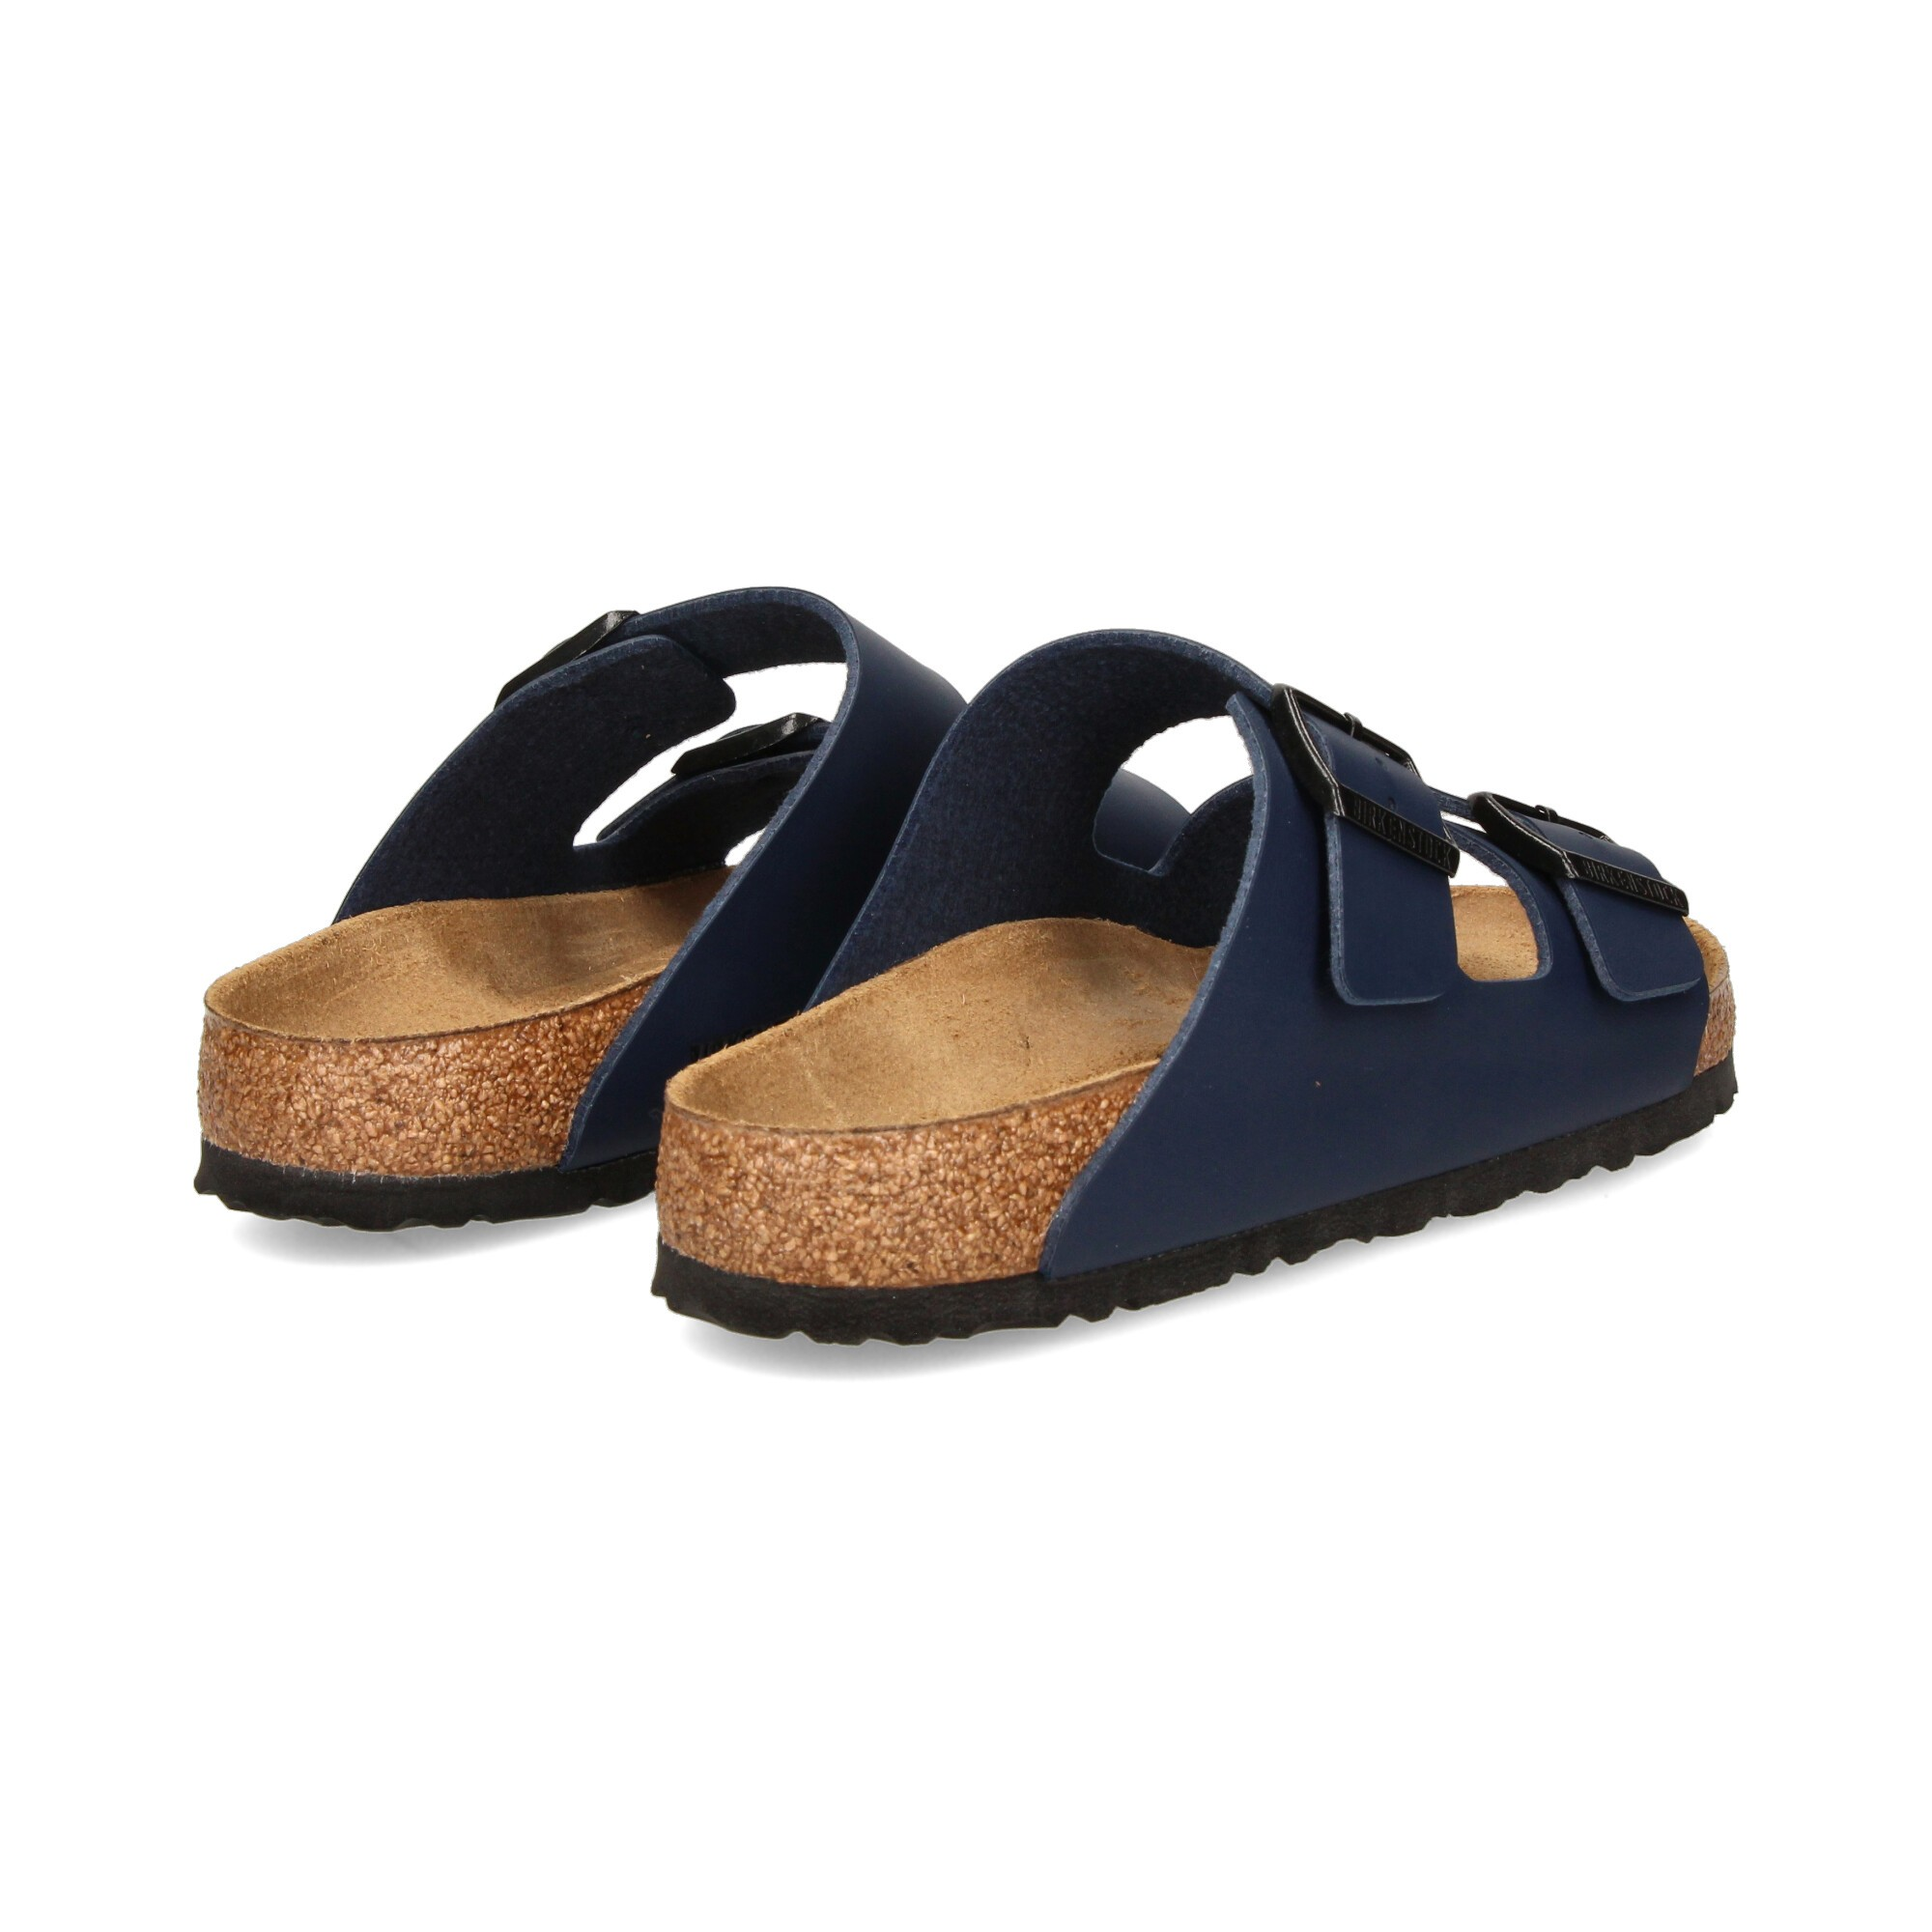 sandalia-2-correas-birko-flor-azul